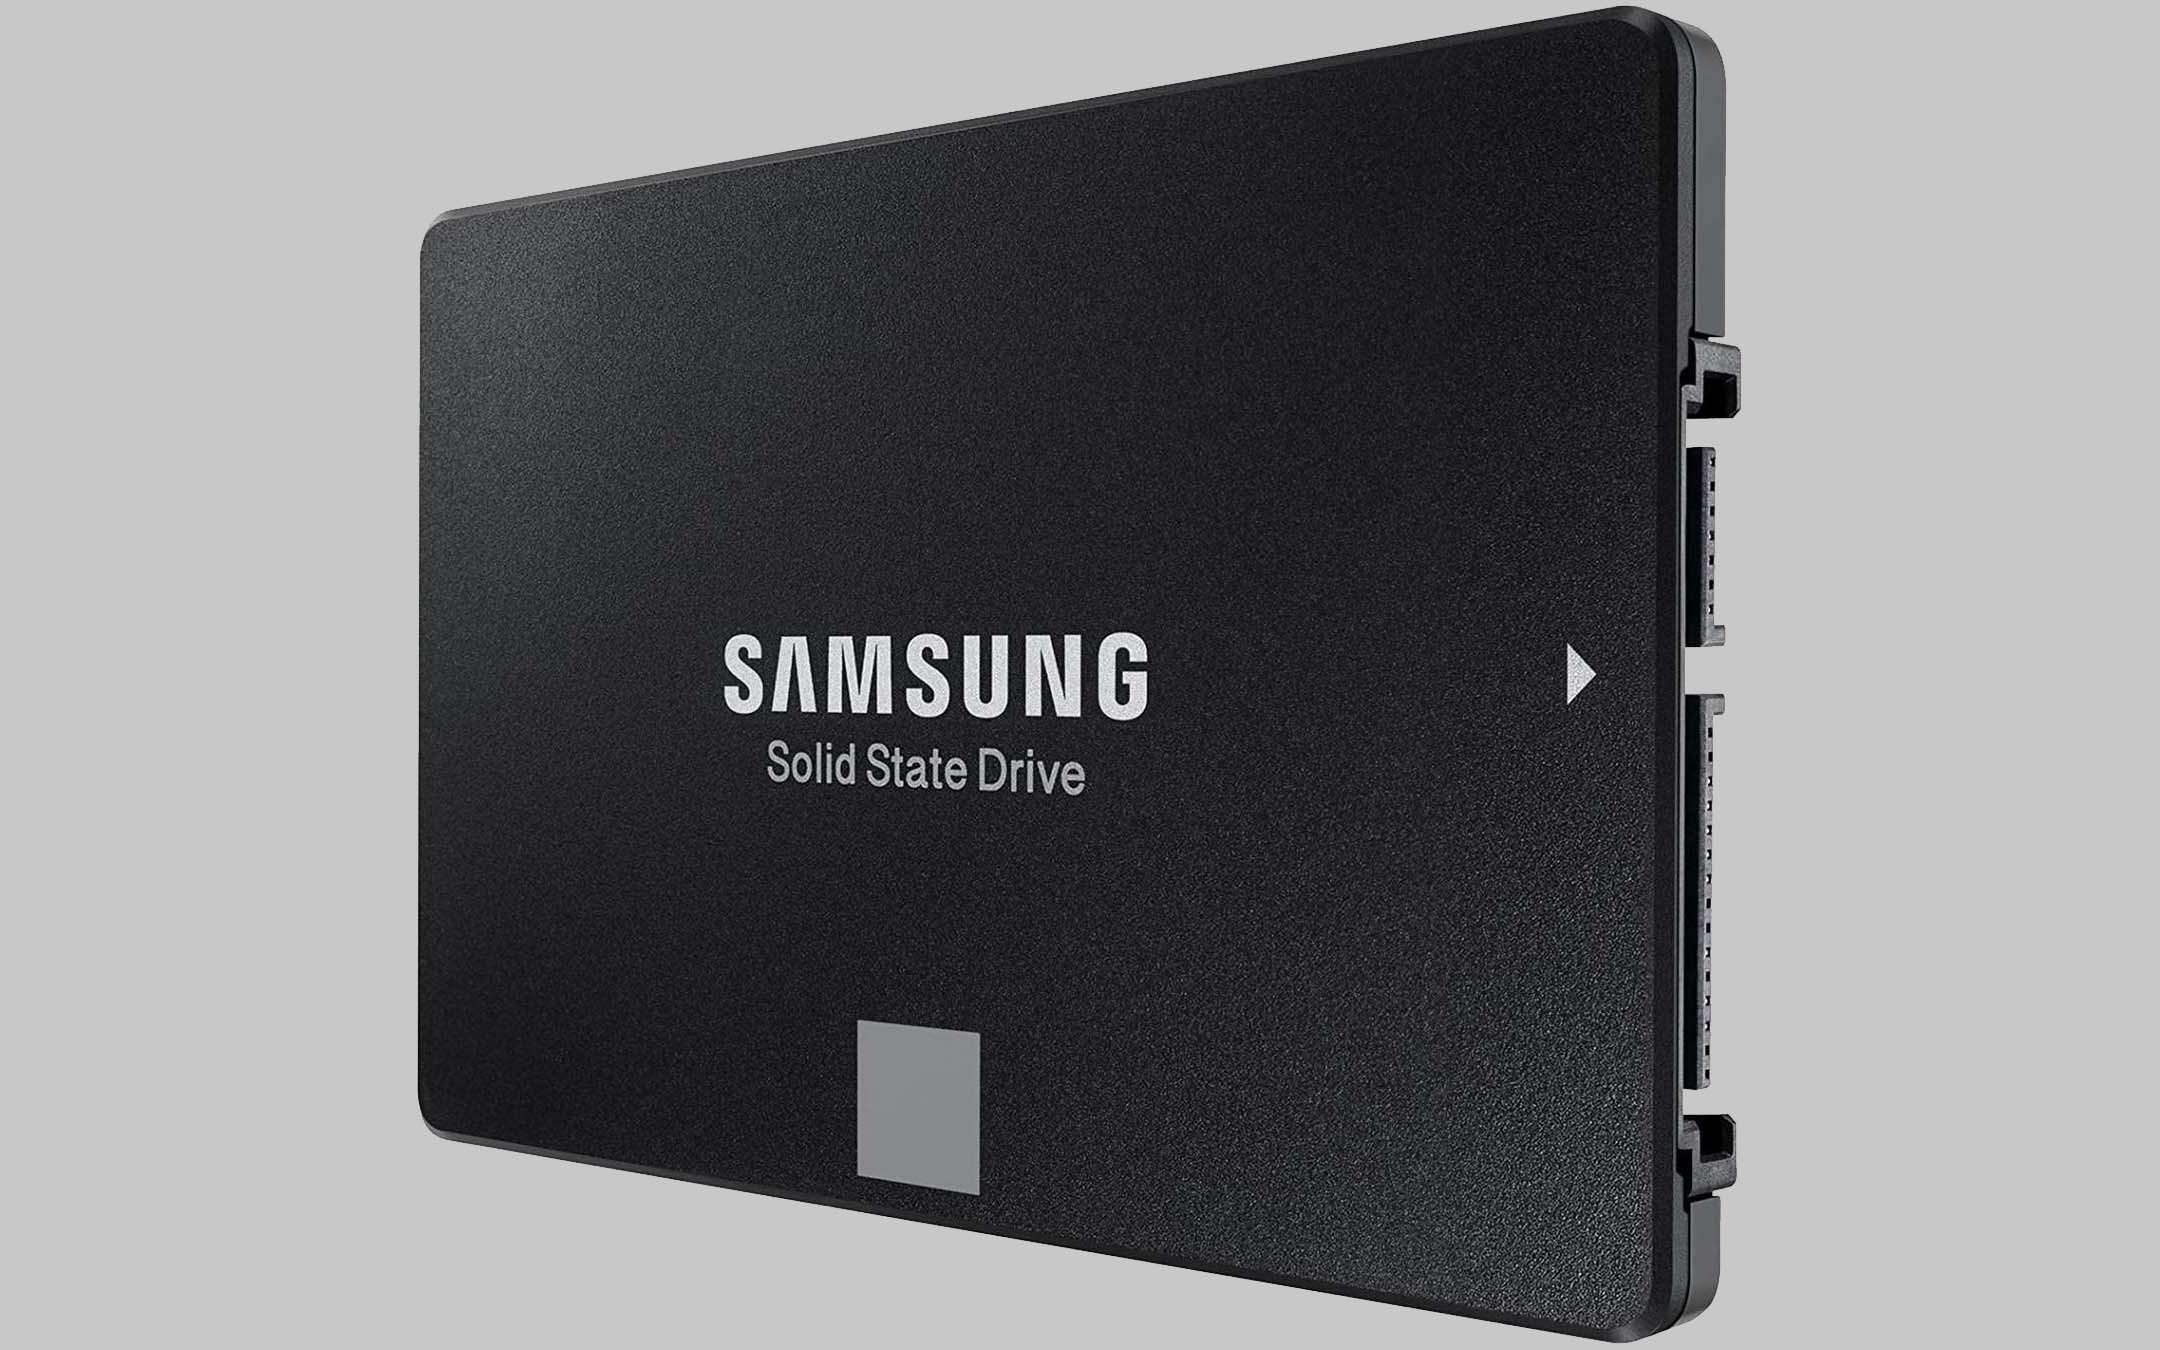 Samsung 860 EVO SSD 1 TB for 99.99 euros on Amazon